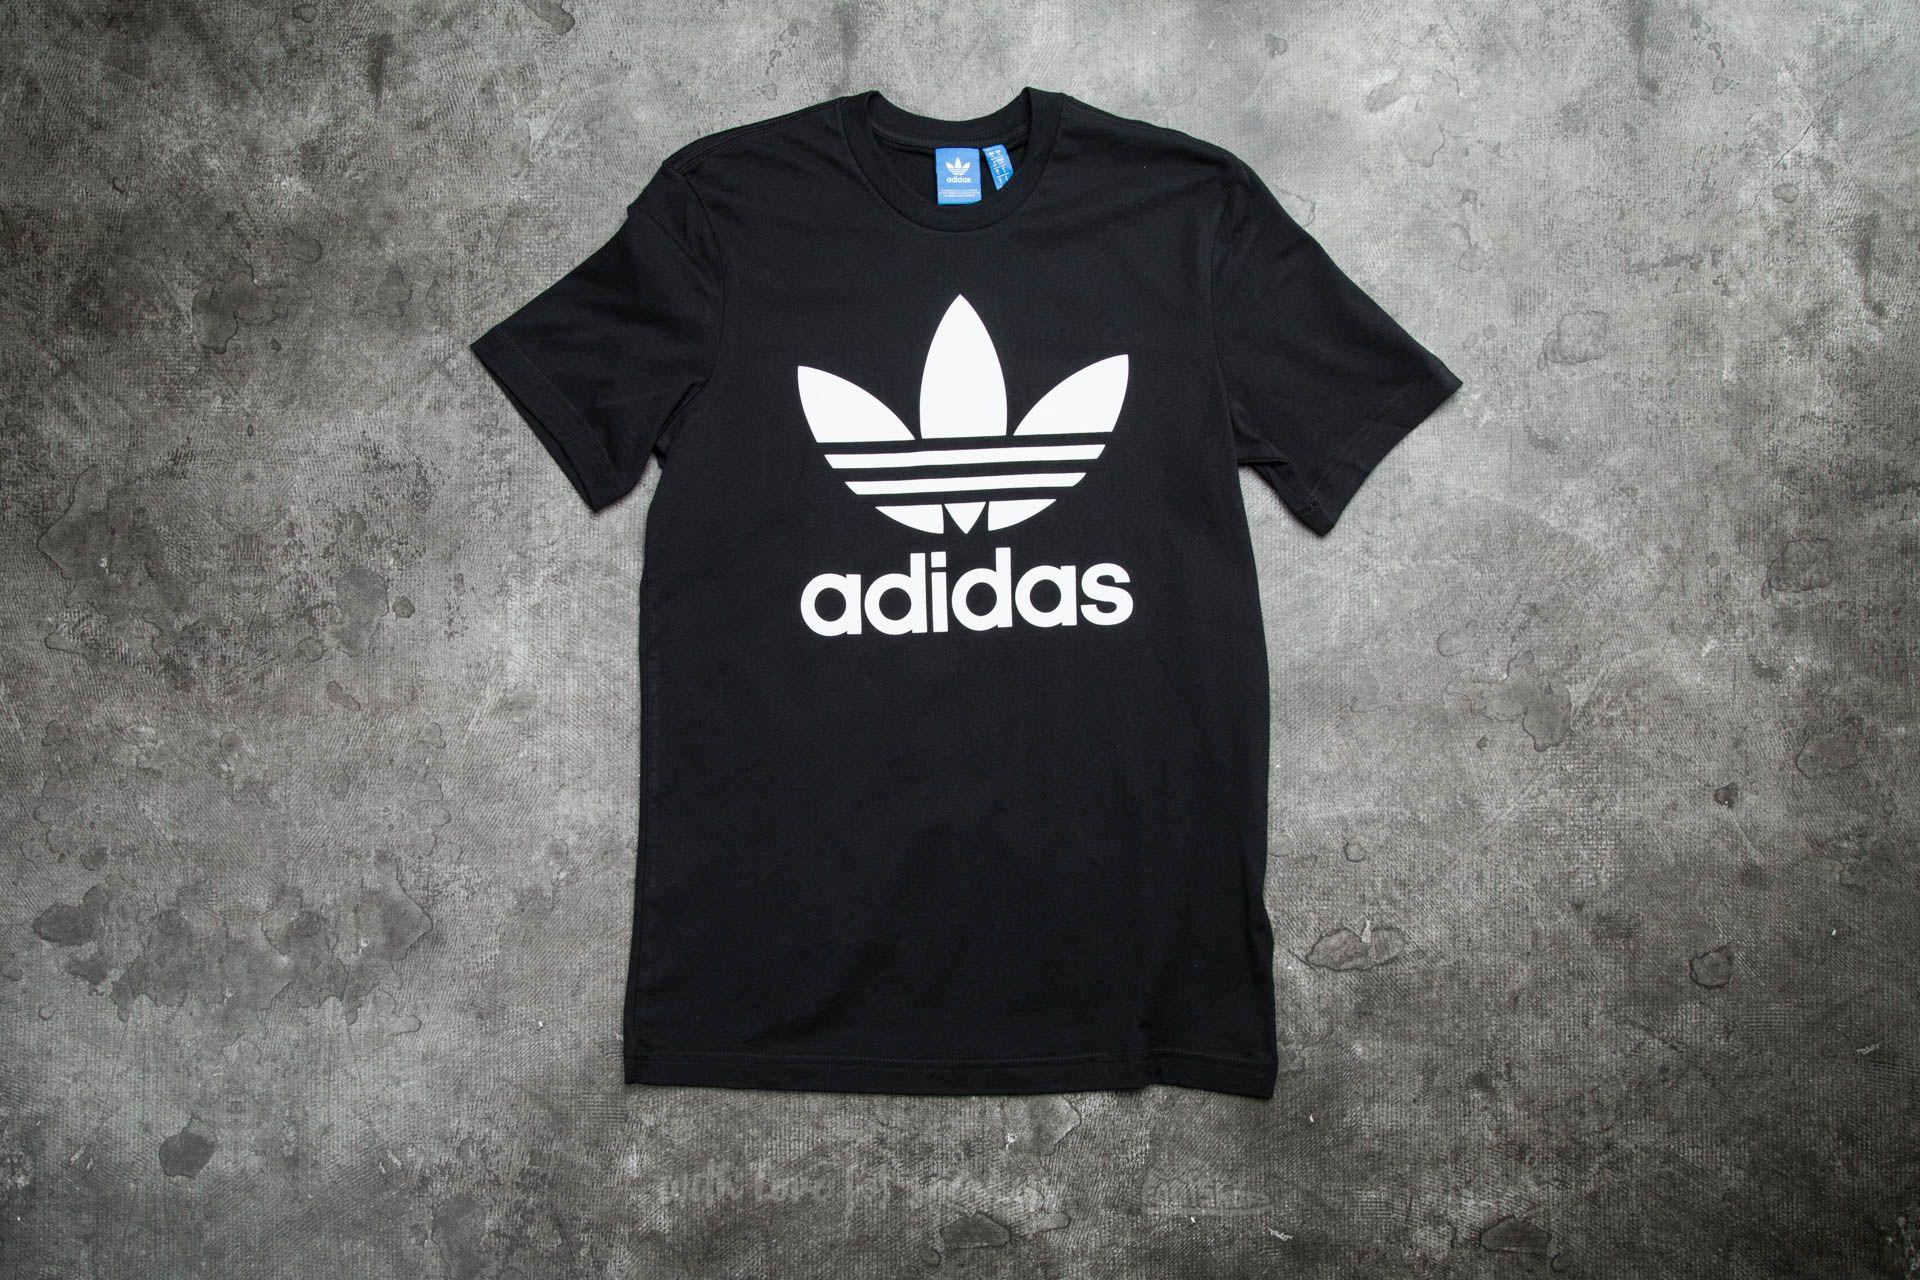 7b91f2451af adidas Originals Trefoil Tee Black | Footshop